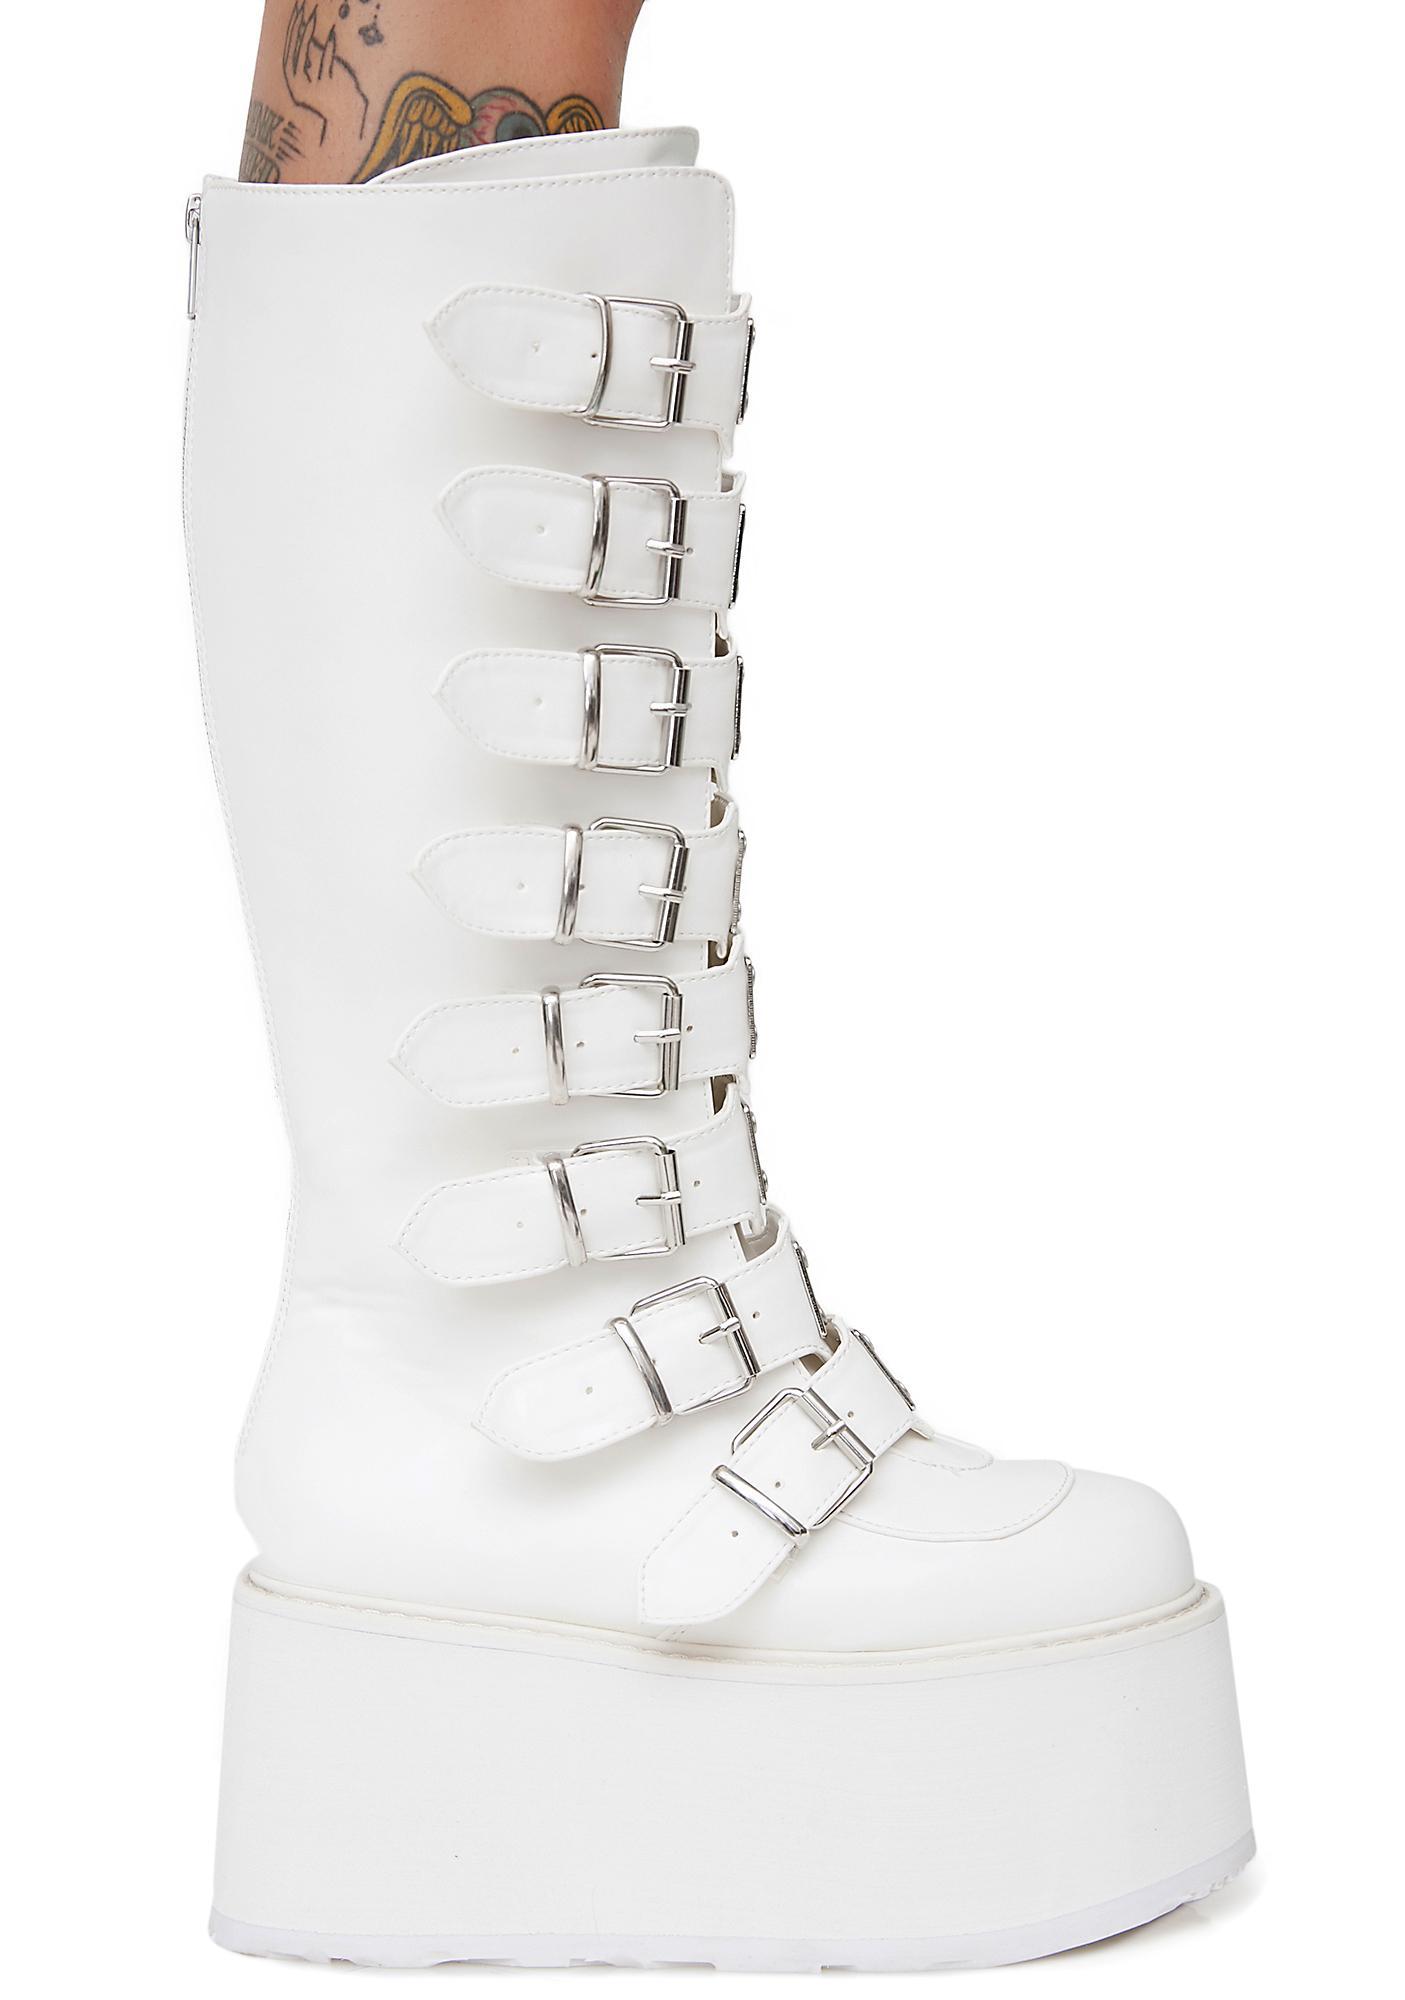 Demonia Morpheus Platform Boots